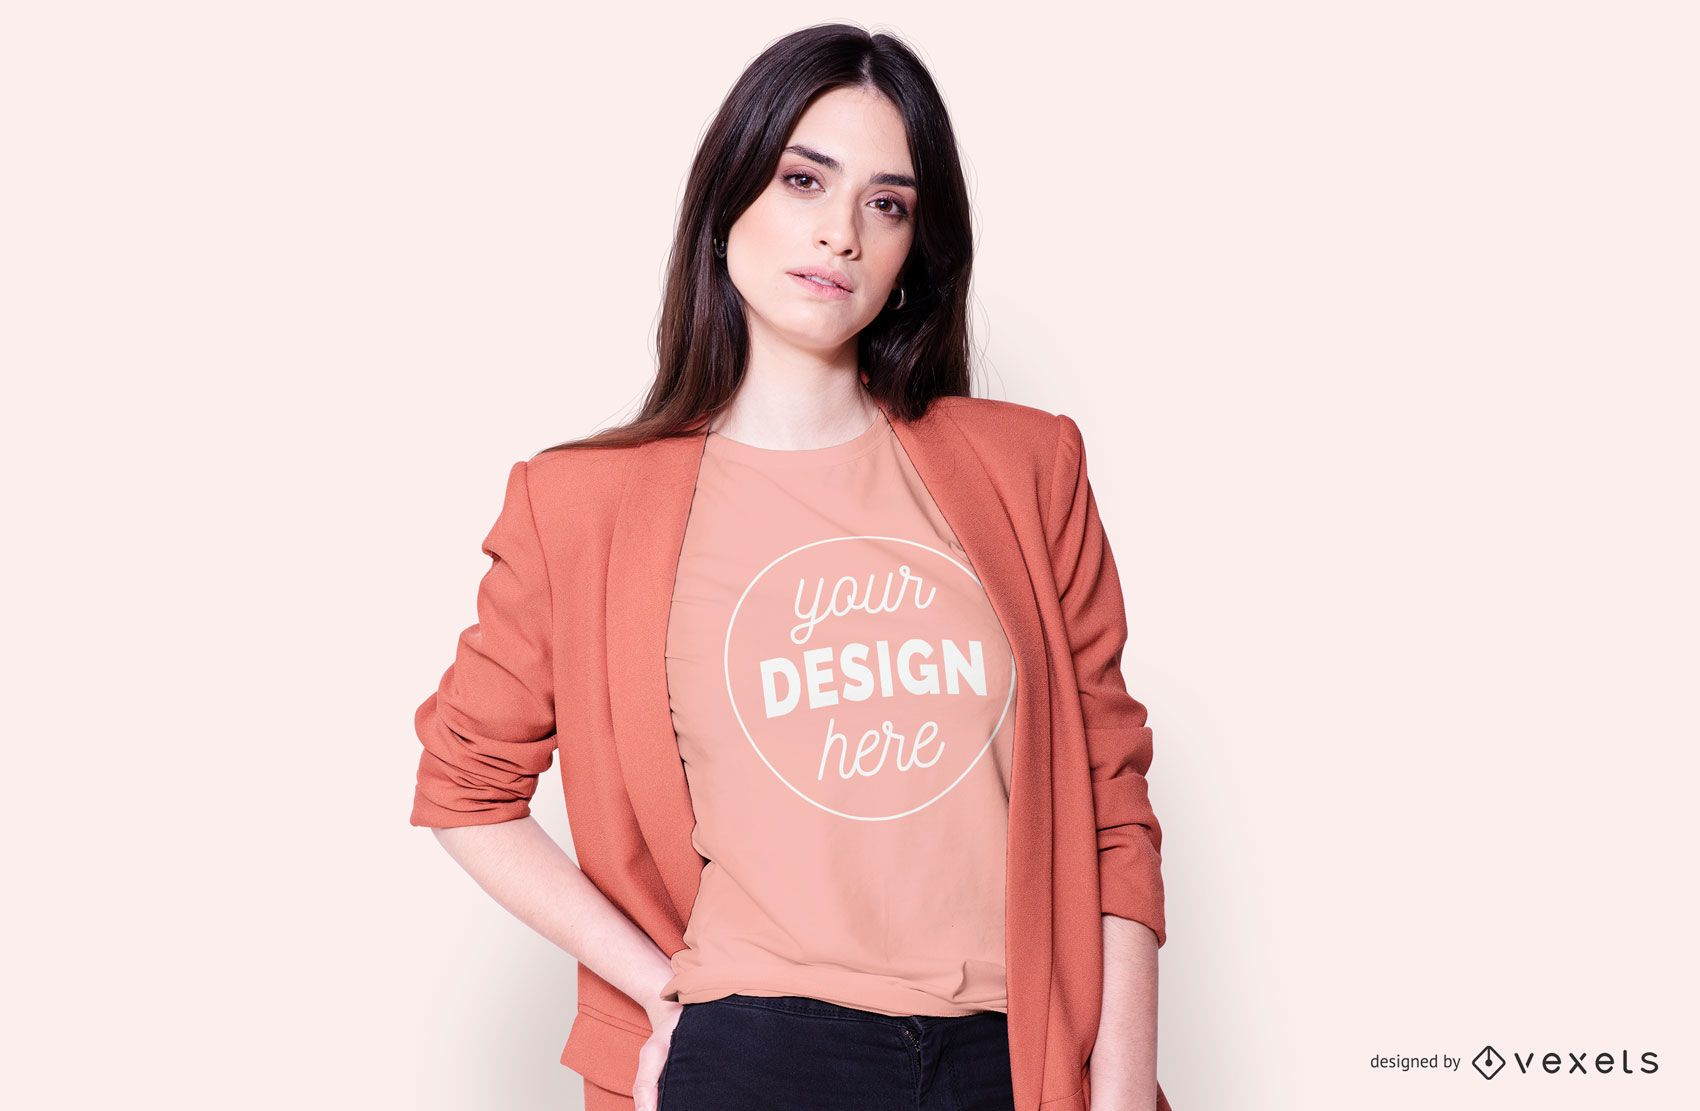 Girl Fashion Jacket T-shirt Mockup